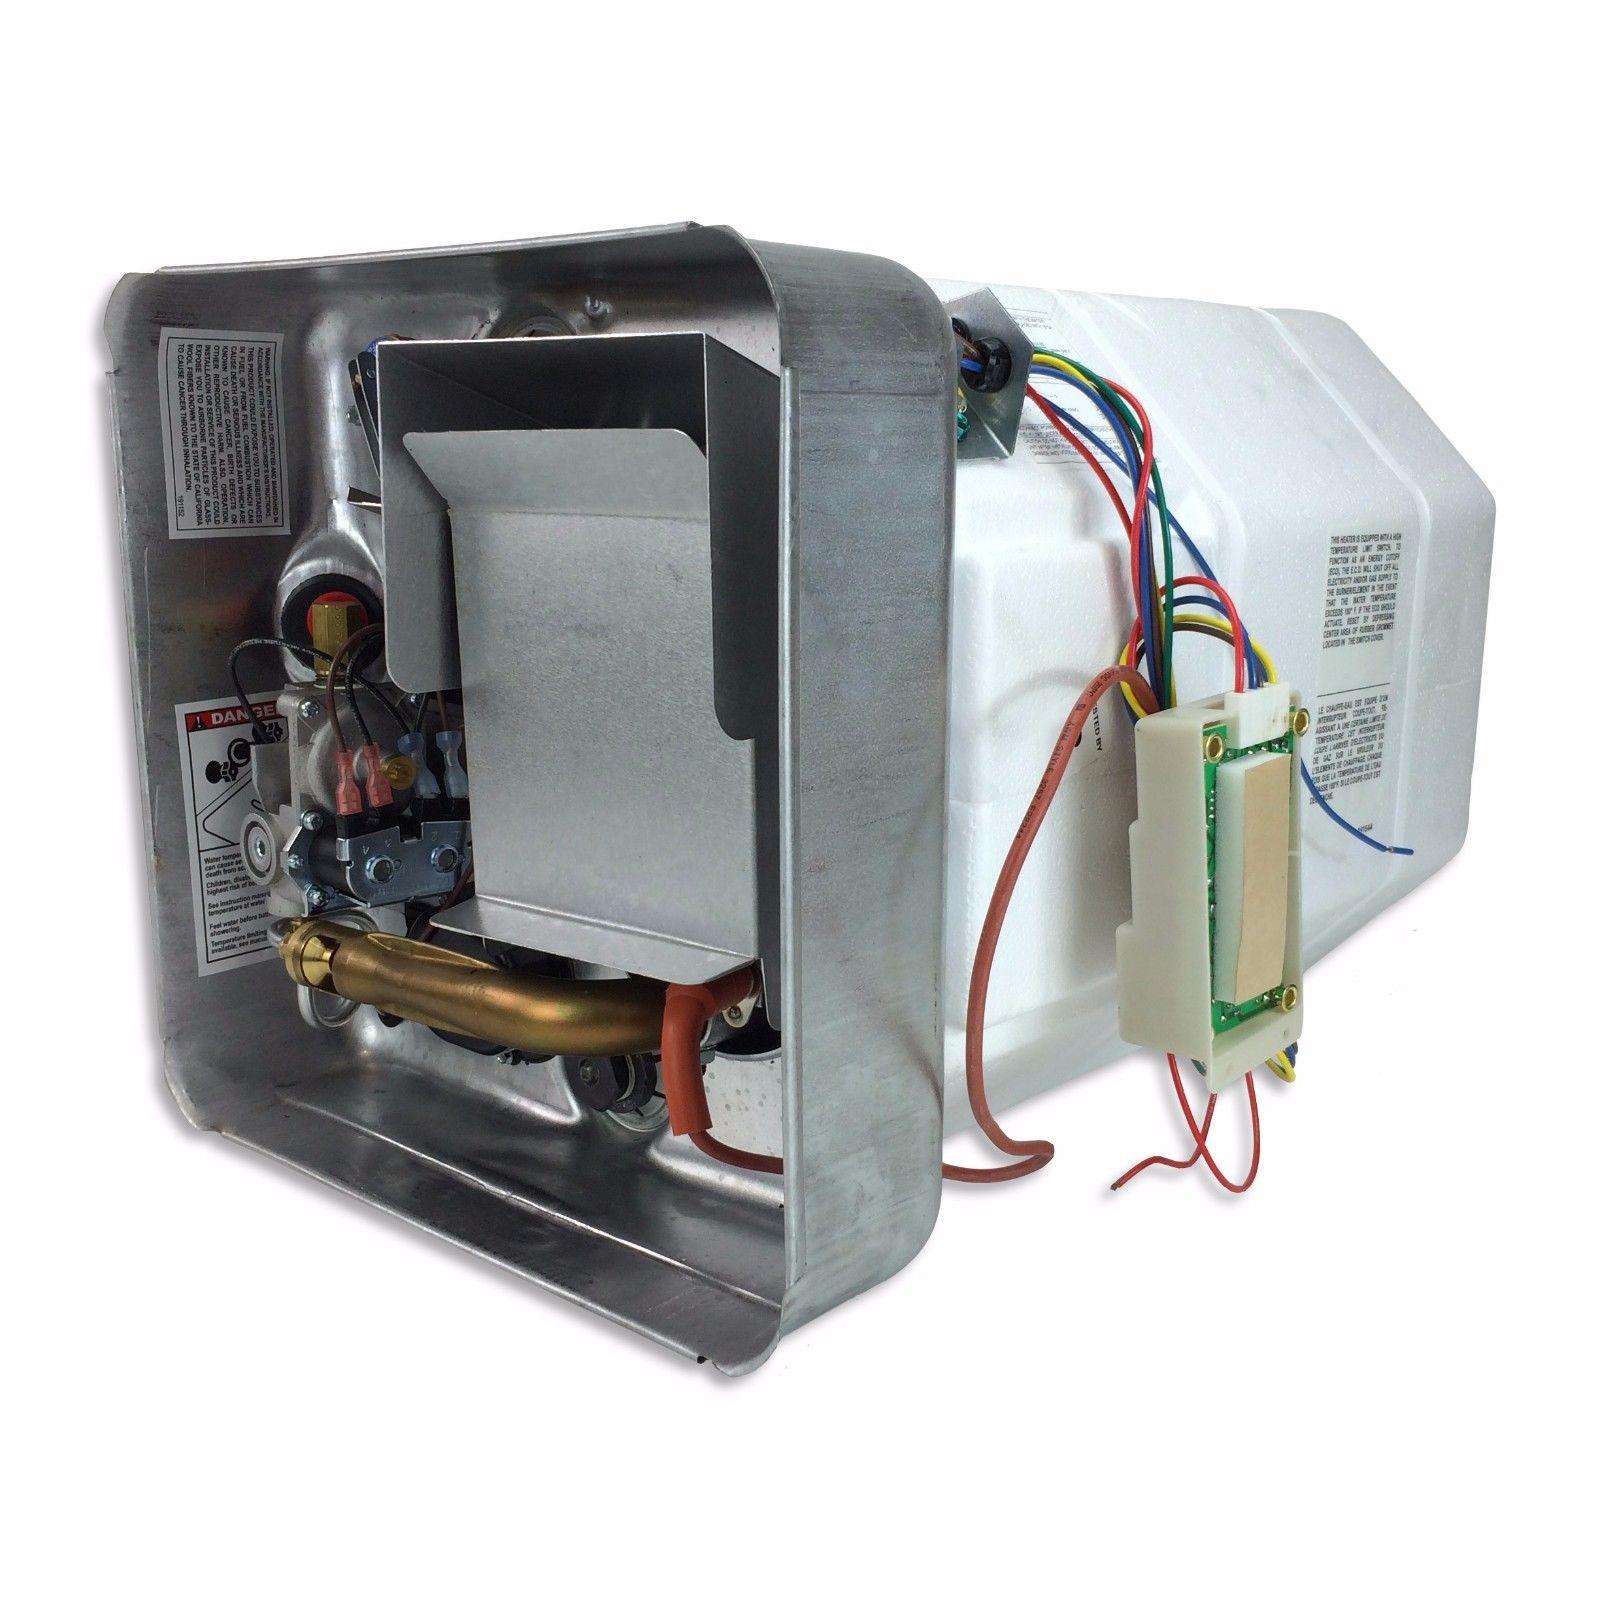 water heater.JPG